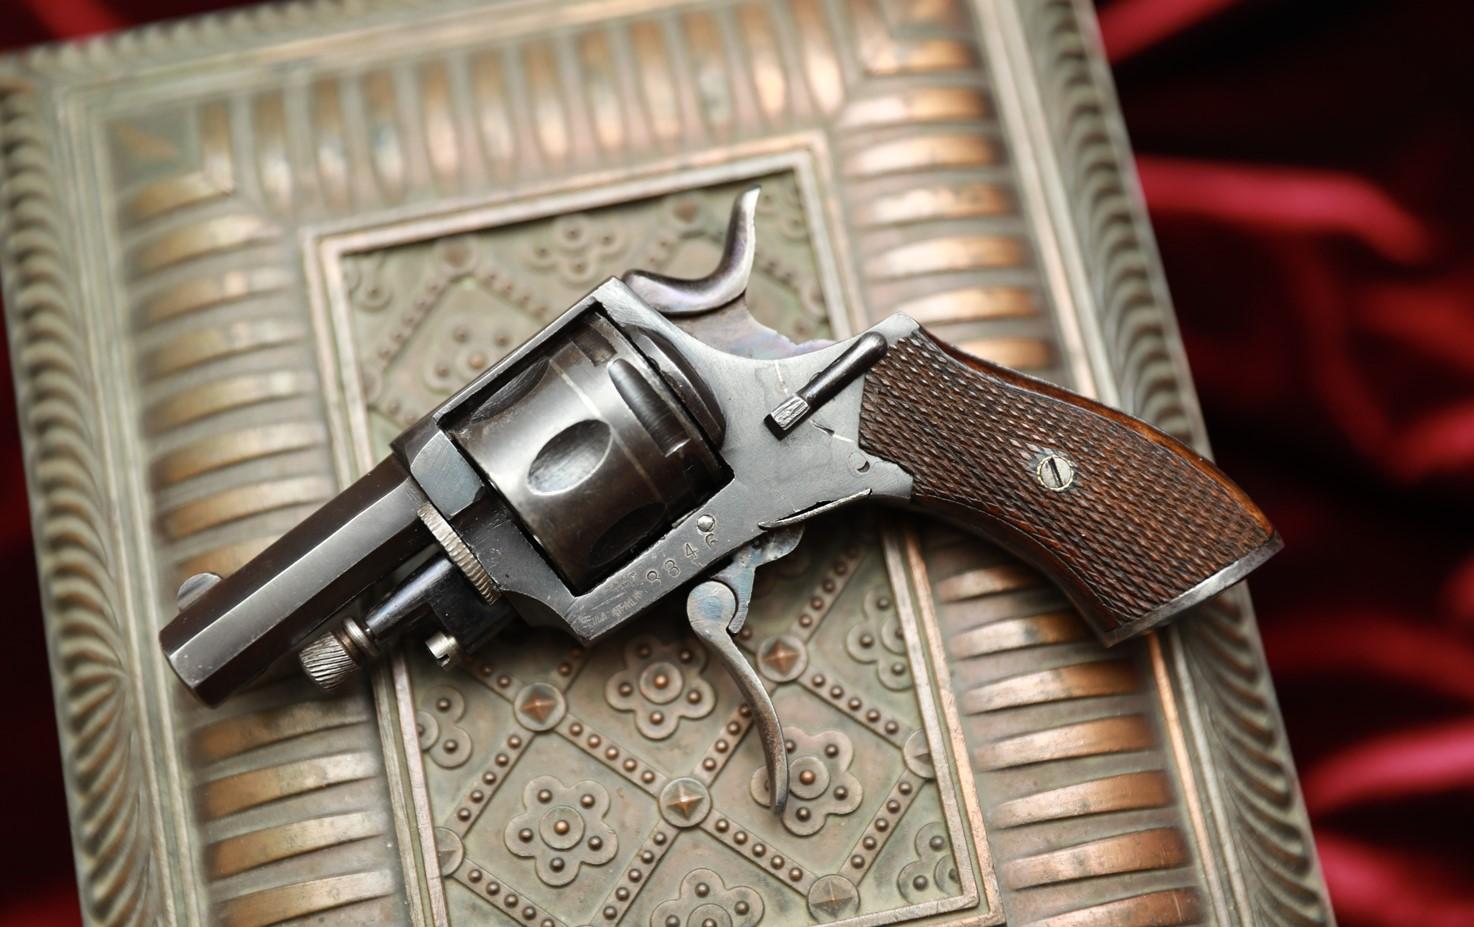 Фото Револьвер Велодог №8846, XIX век